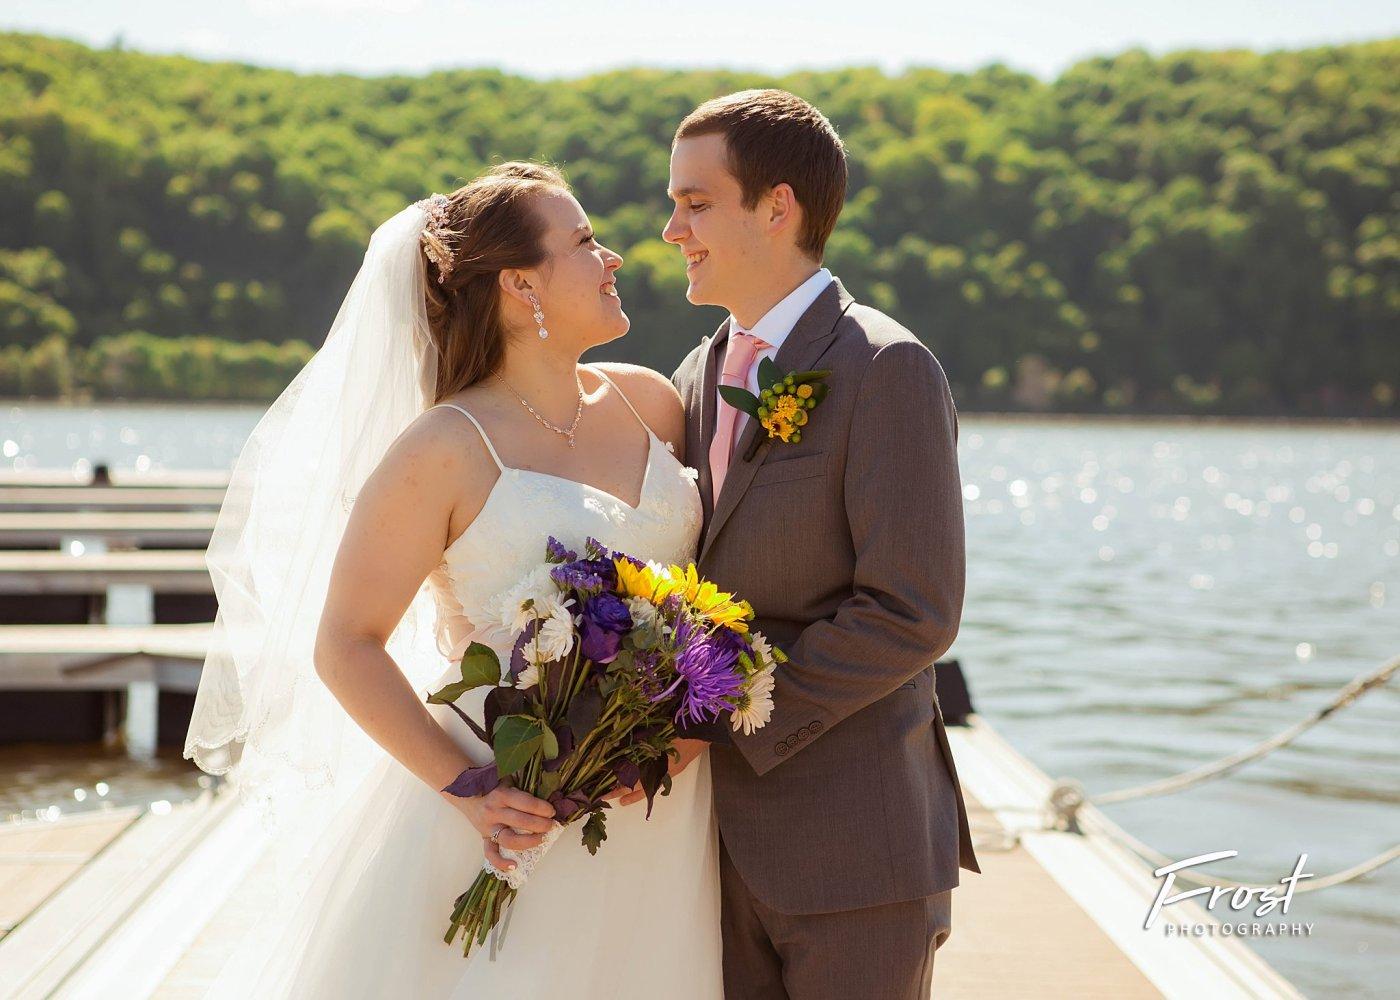 Wedding Photography Poughkeepsie Ny